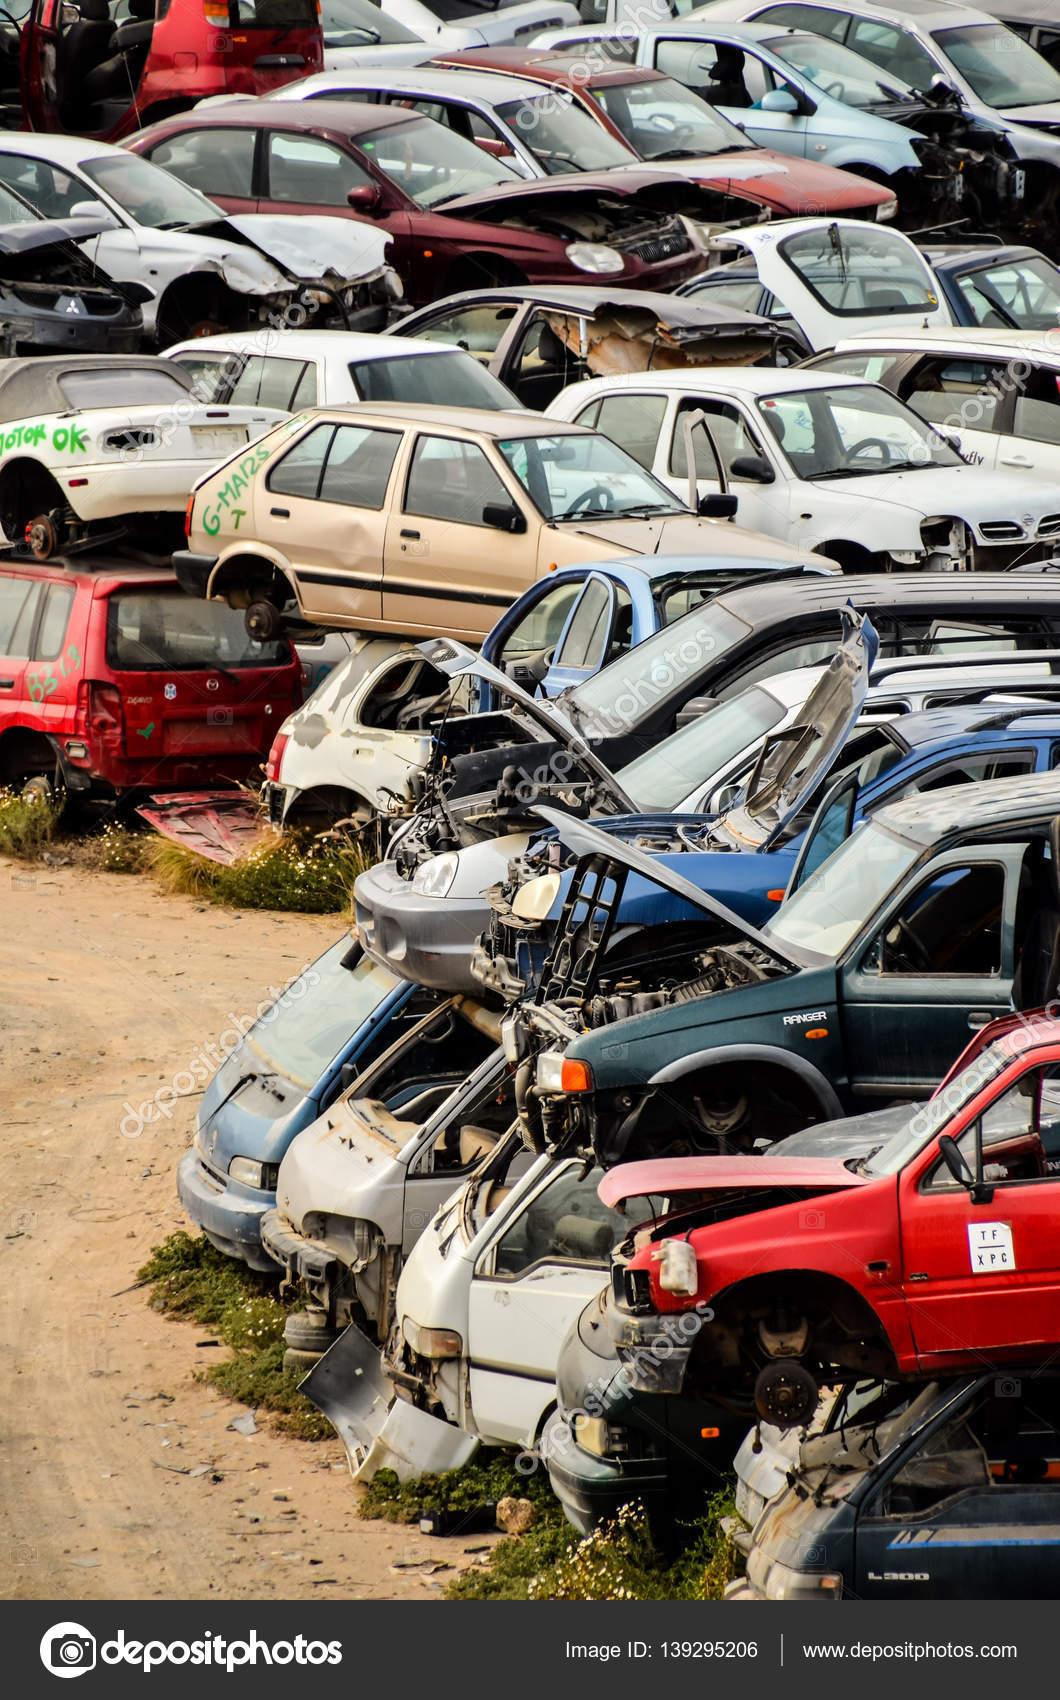 Old Junk Cars On Junkyard — Stock Photo © underworld1 #139295206